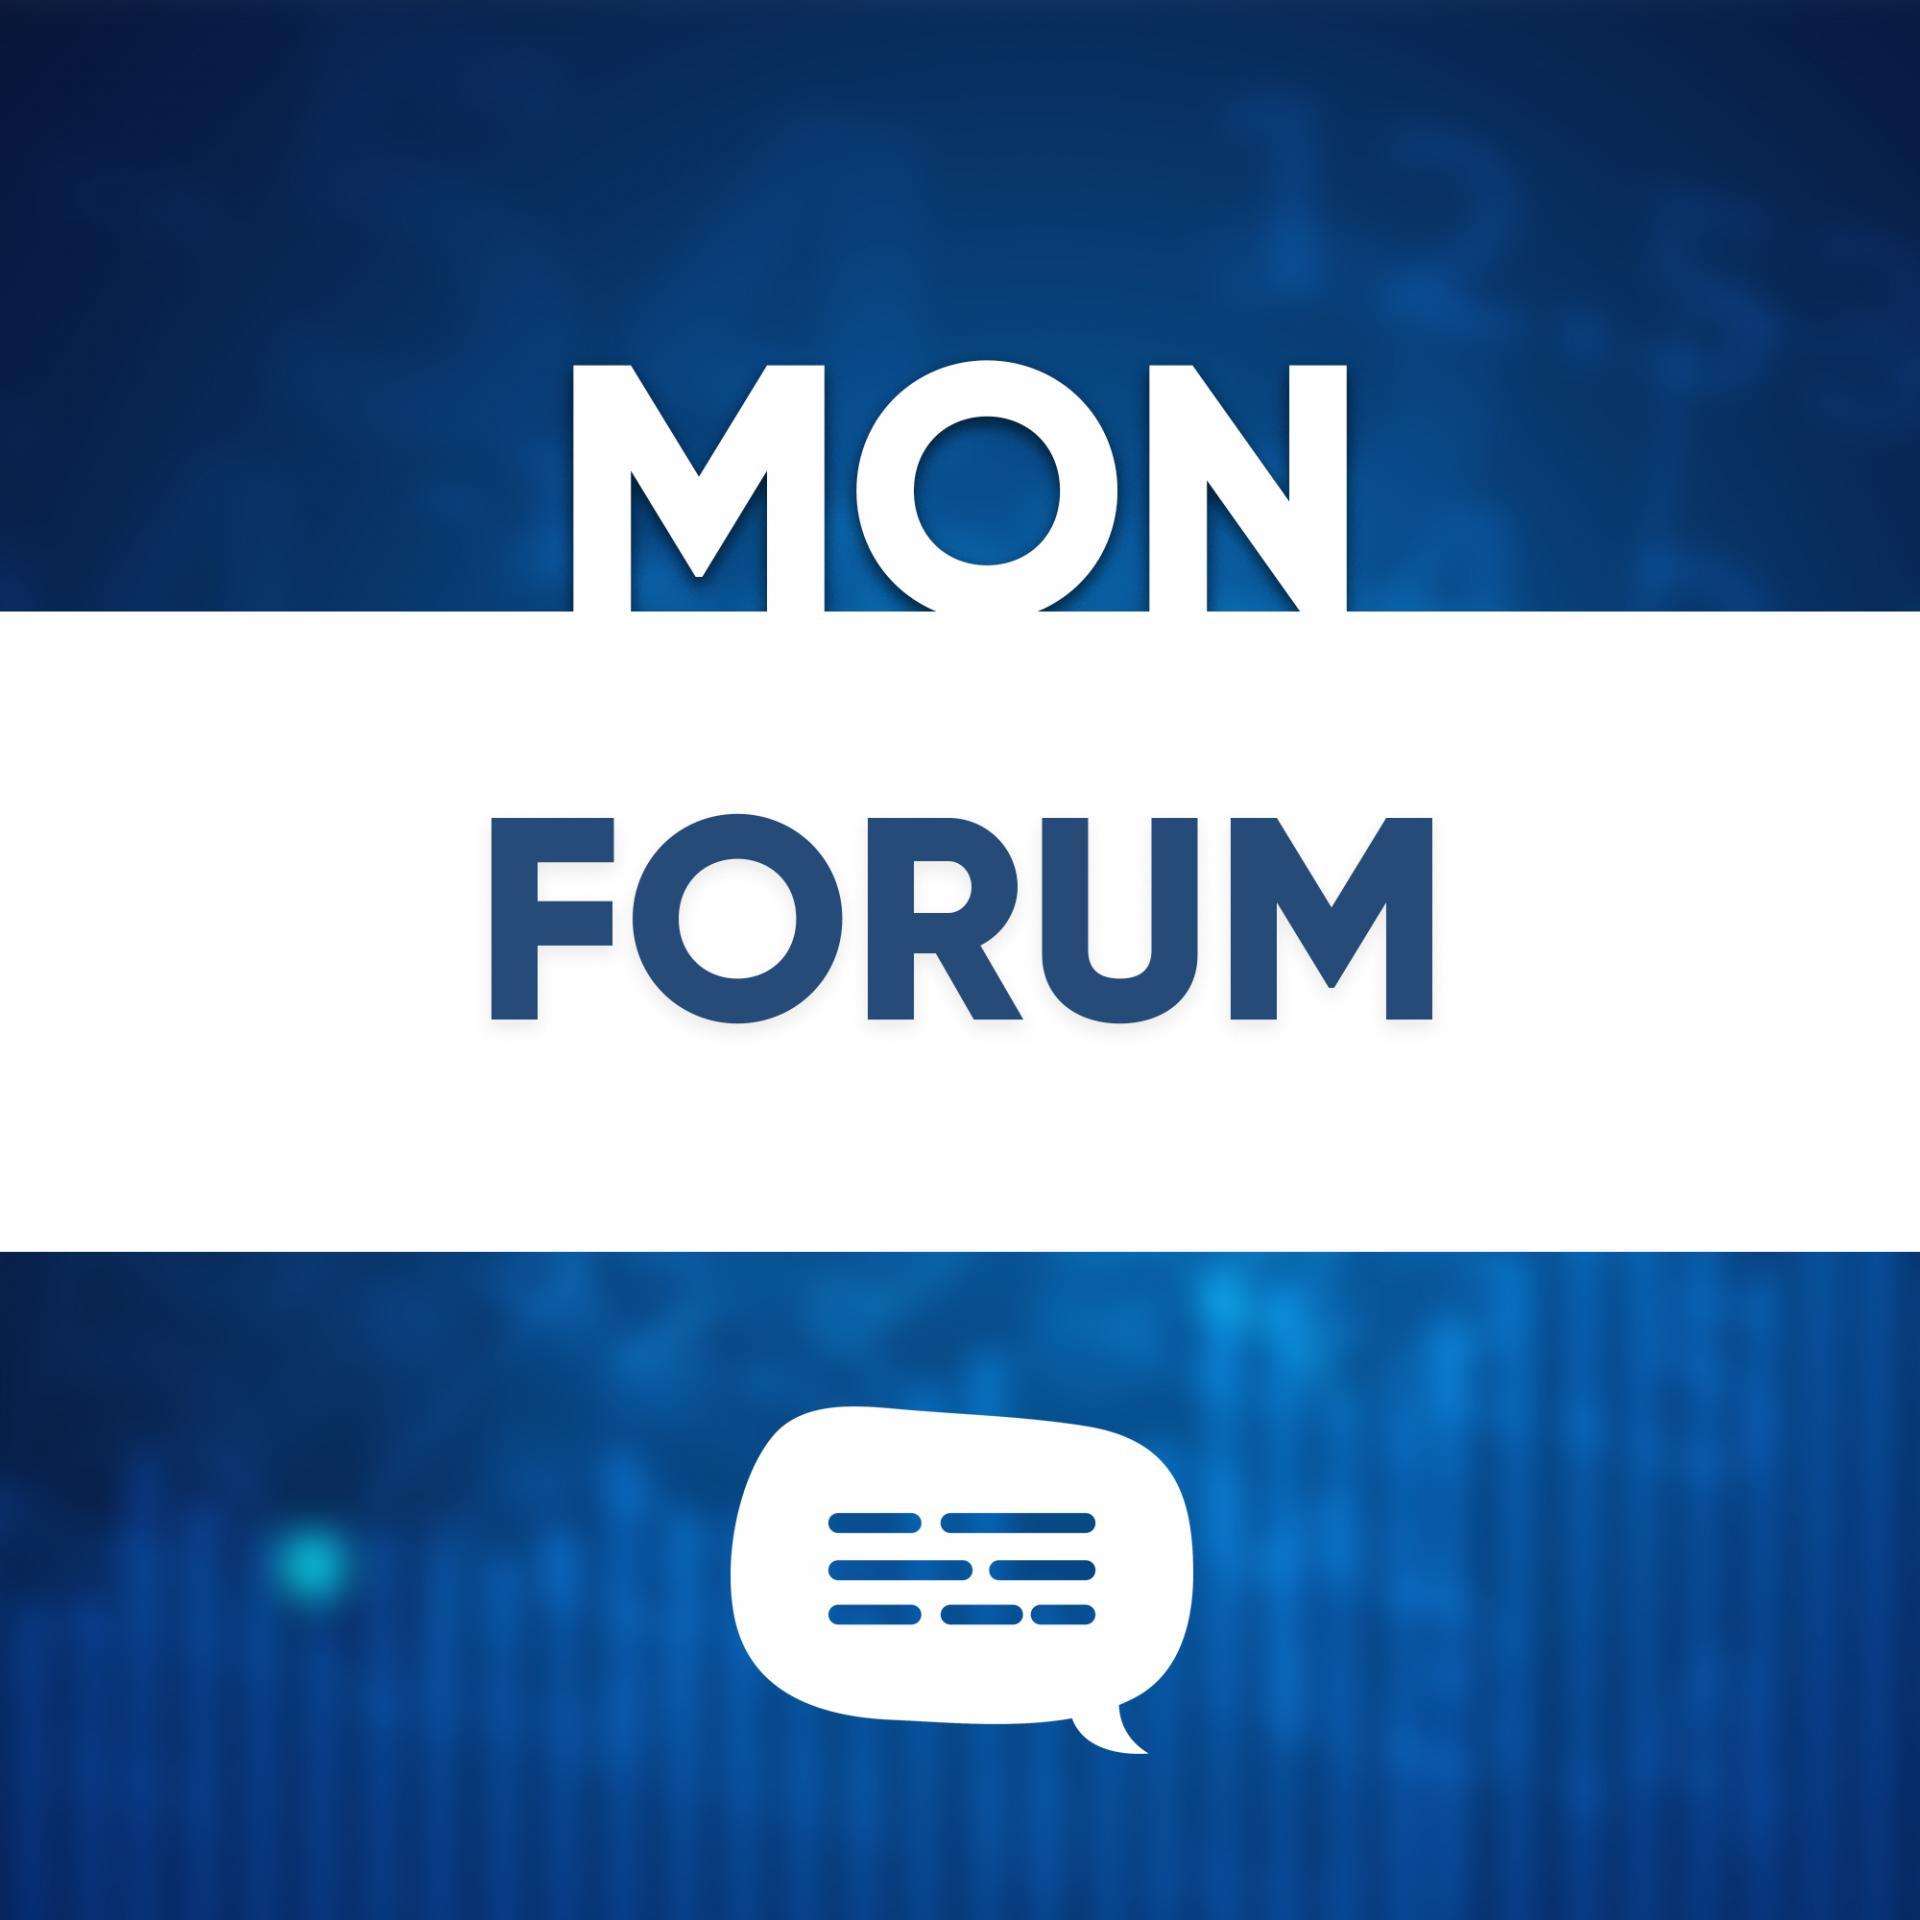 Forum hd